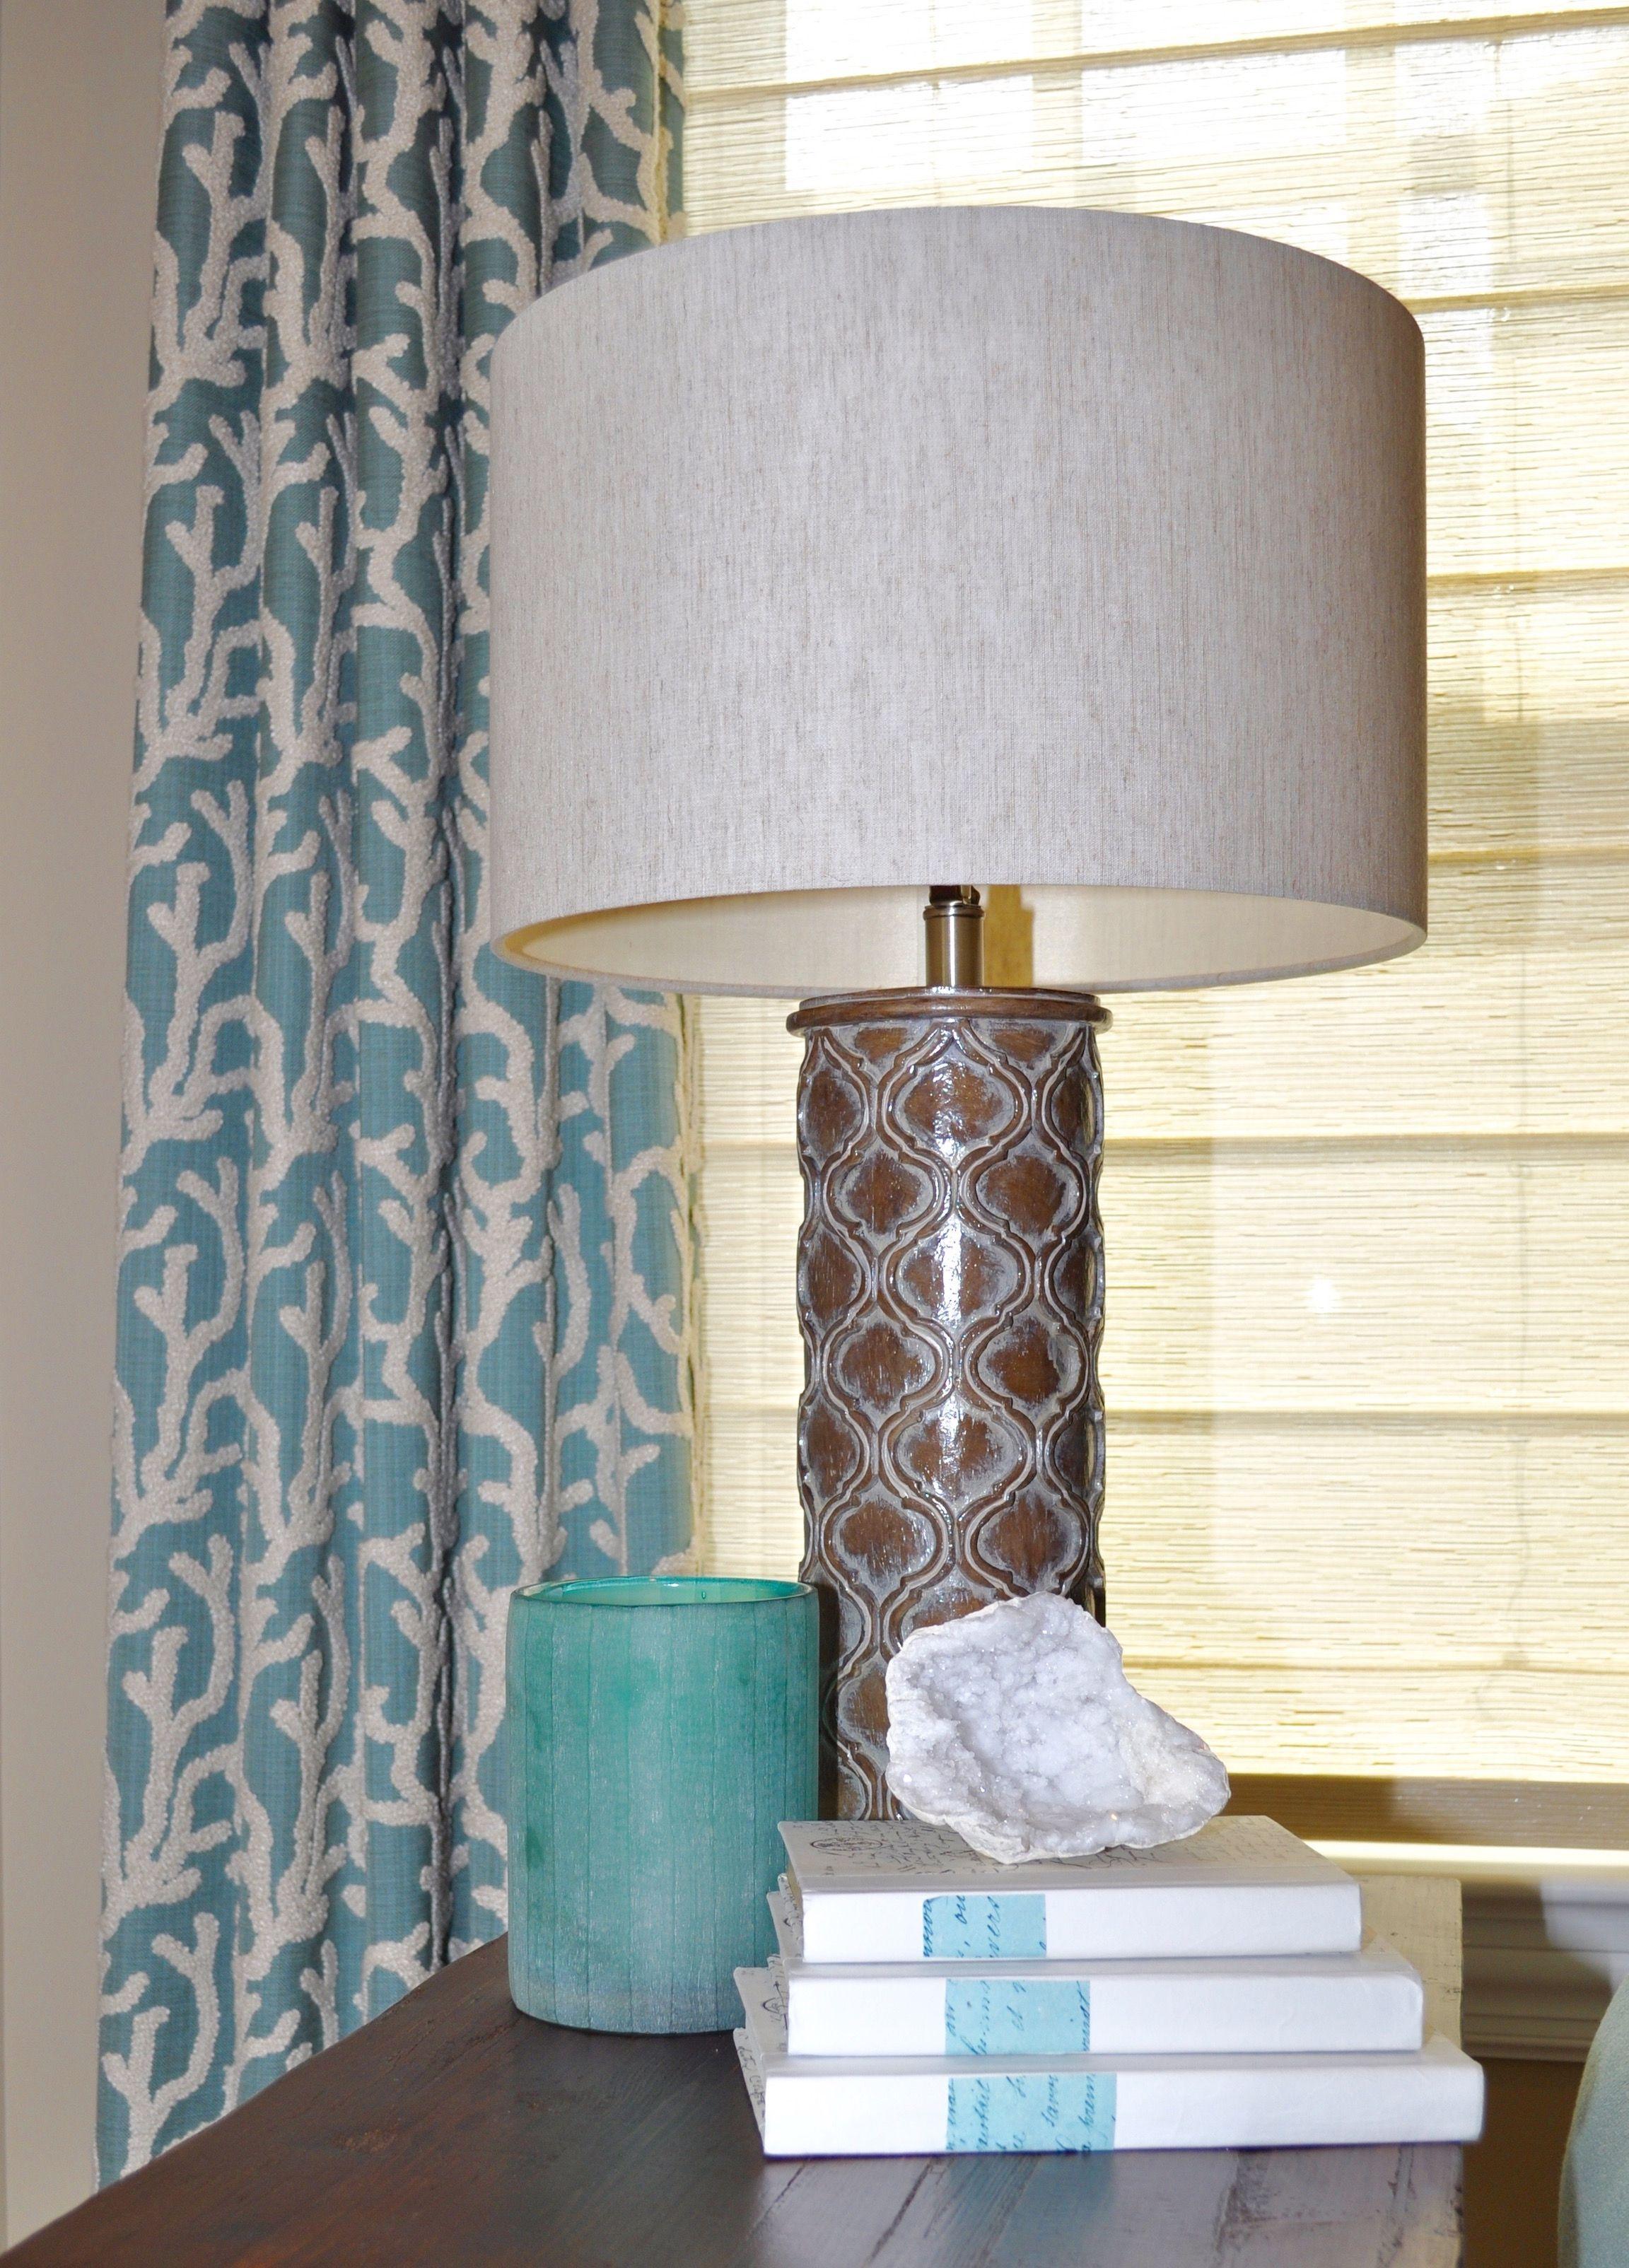 Coastal Interior Design, Coral Window Treatments, Shades Of Blue, Accessories,